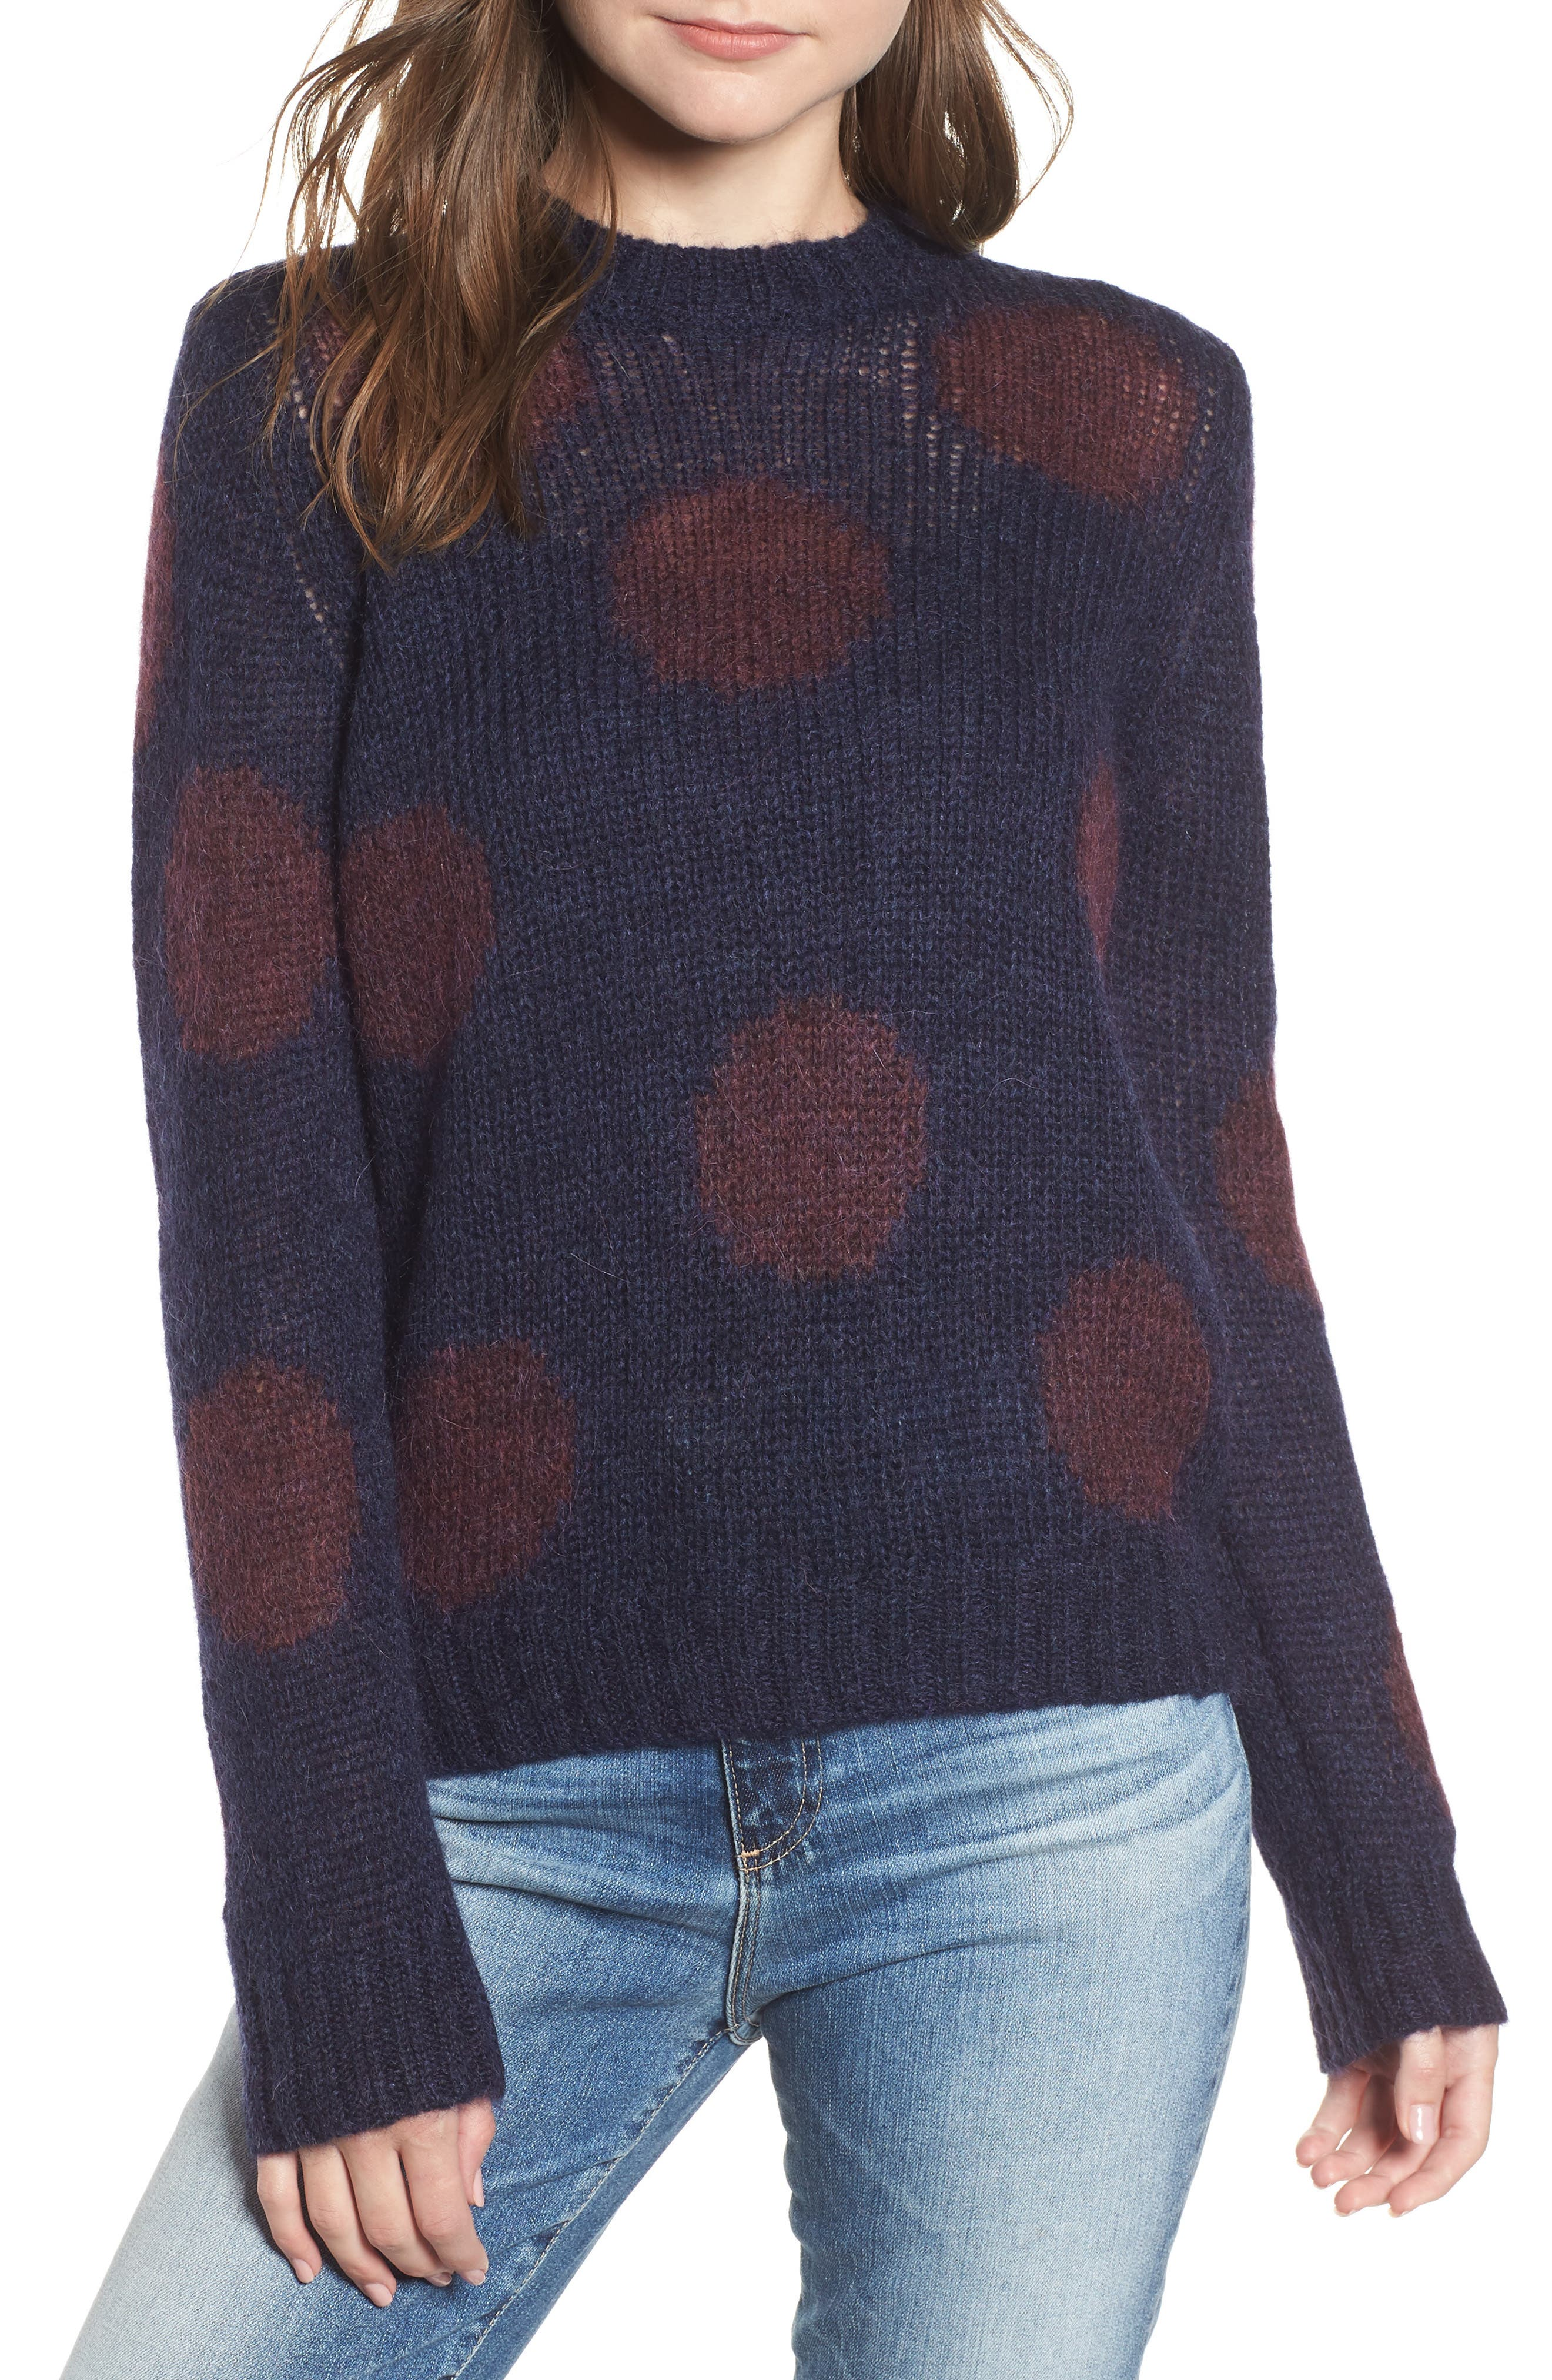 Ansley Crewneck Sweater,                         Main,                         color, BLUE VAULT/ RICH CHARMINE